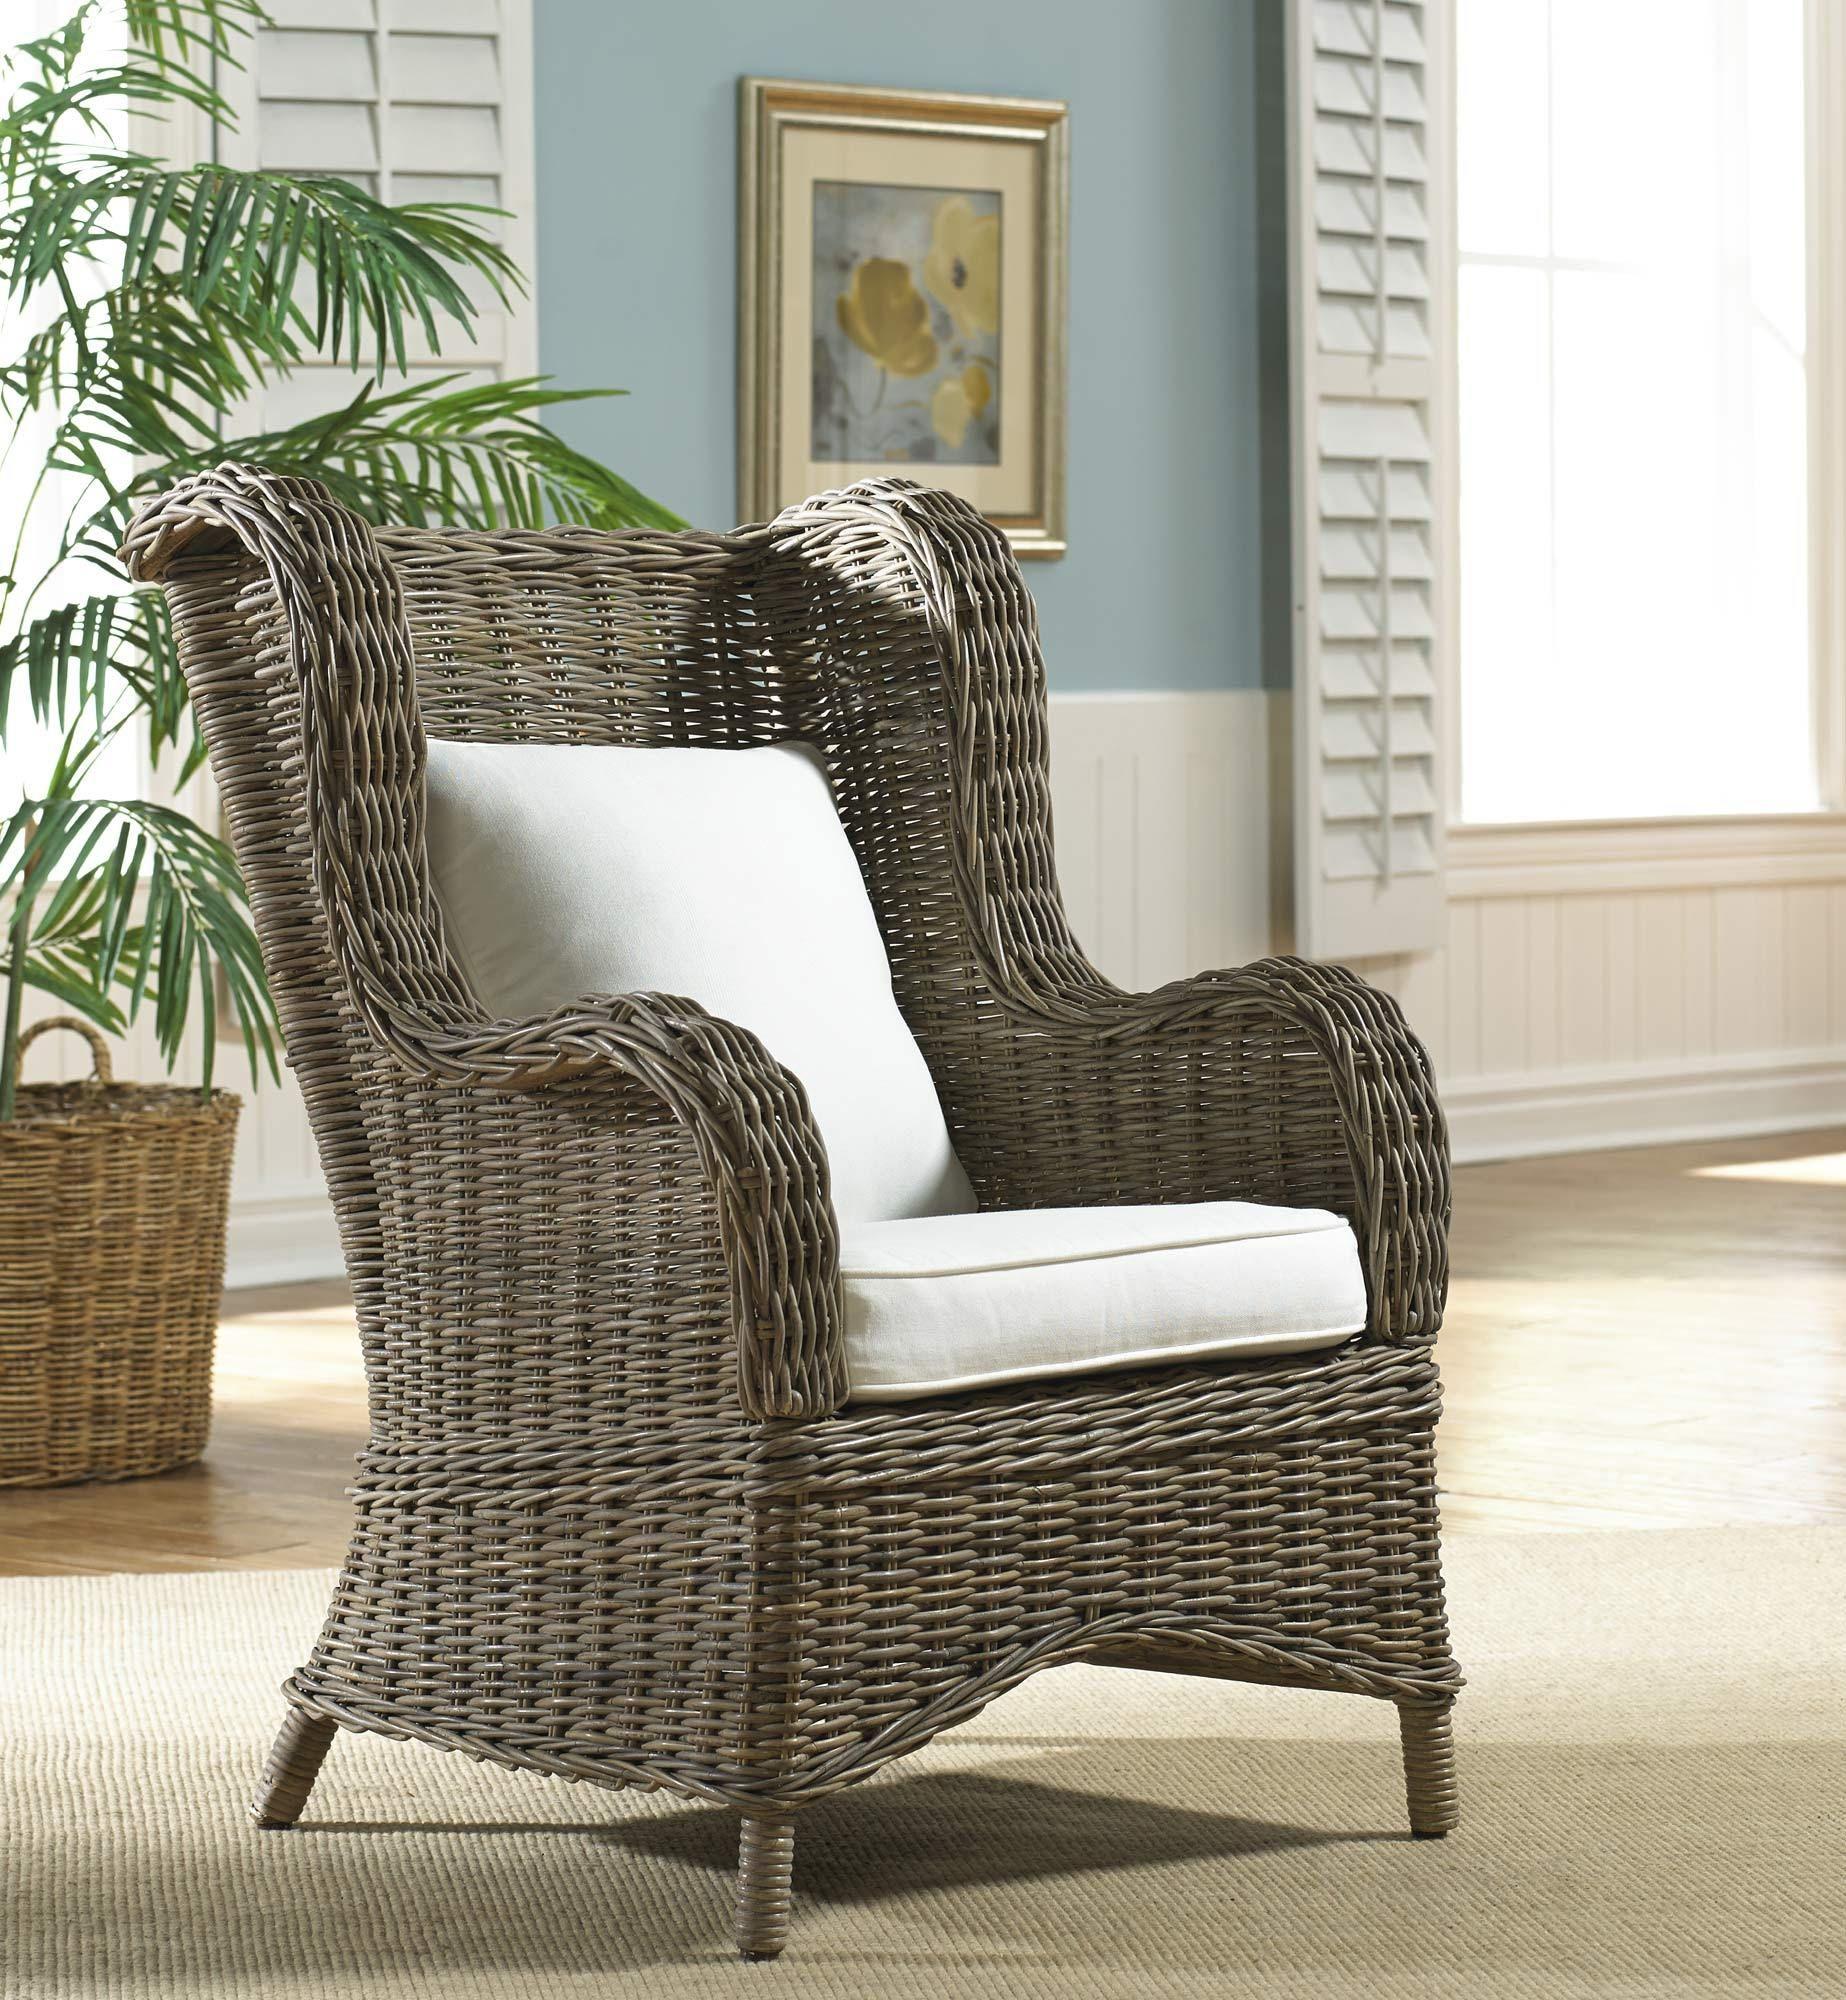 Exuma occasional chair with cushion hospitality rattan